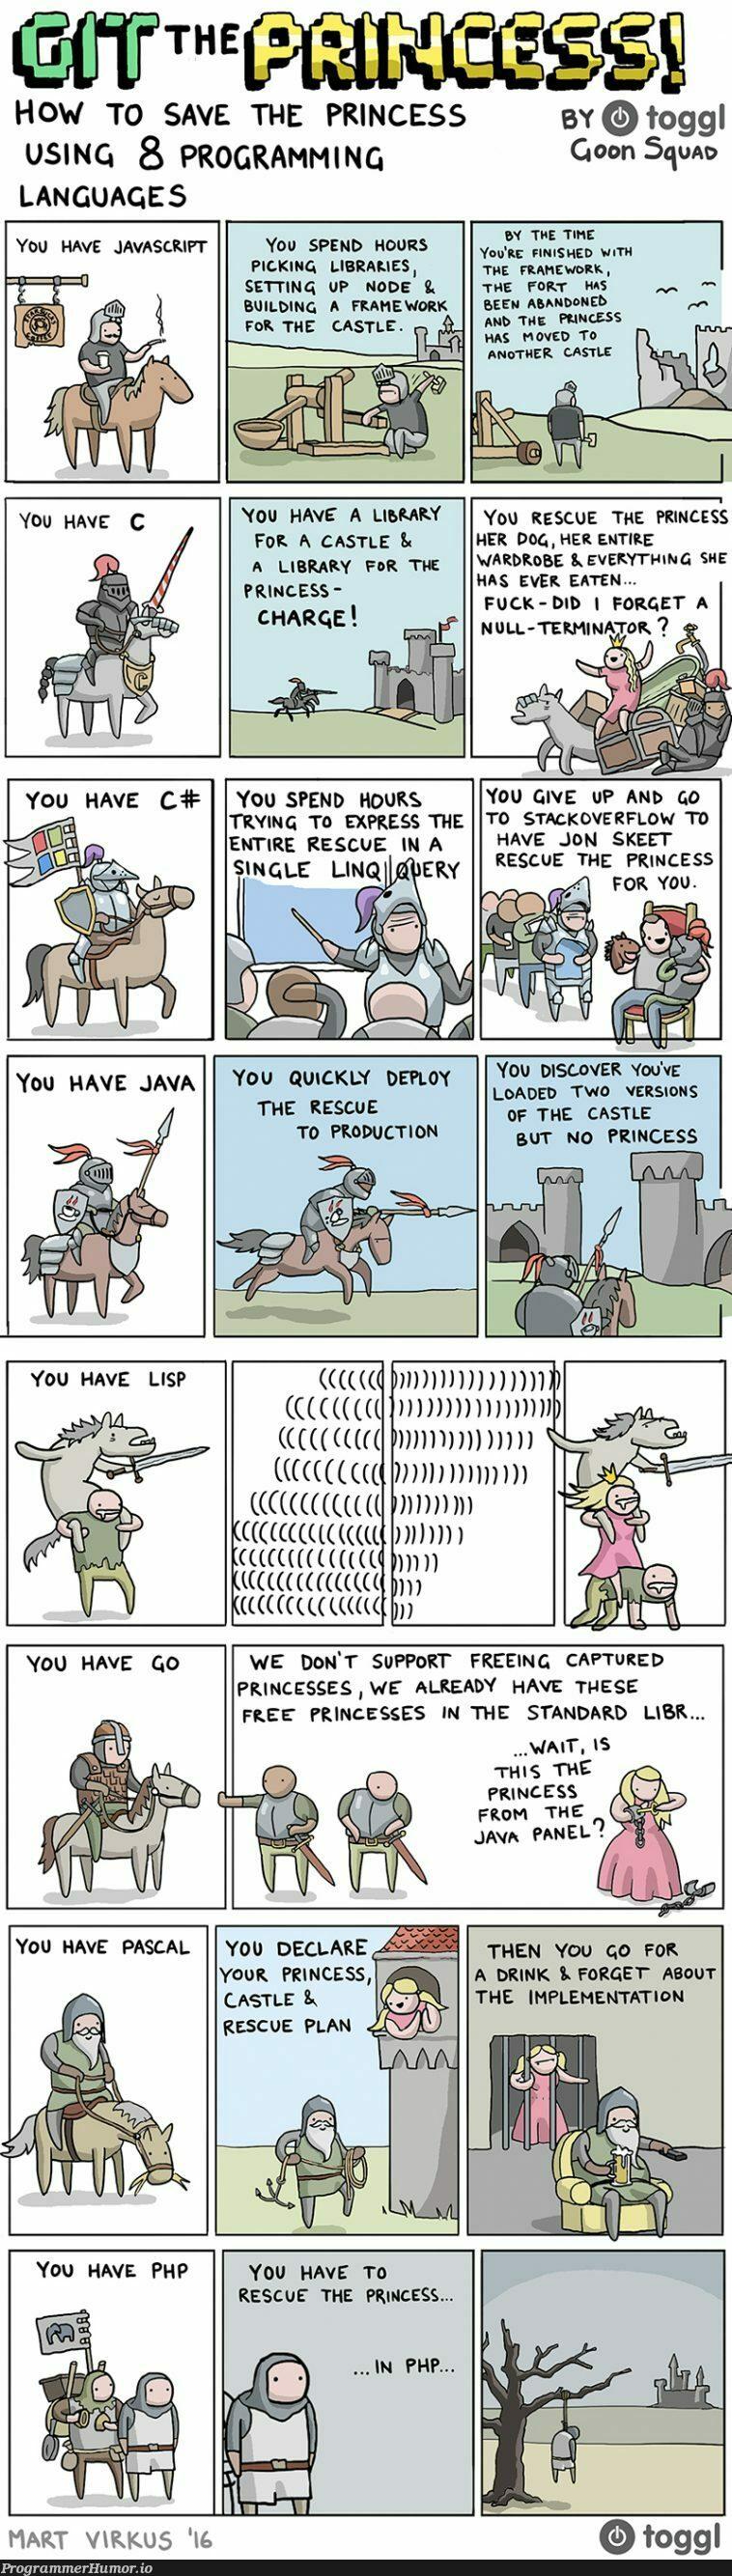 classic | programming-memes, javascript-memes, java-memes, stackoverflow-memes, stack-memes, program-memes, try-memes, node-memes, git-memes, version-memes, express-memes, class-memes, overflow-memes, production-memes, language-memes, framework-memes, product-memes, programming language-memes | ProgrammerHumor.io